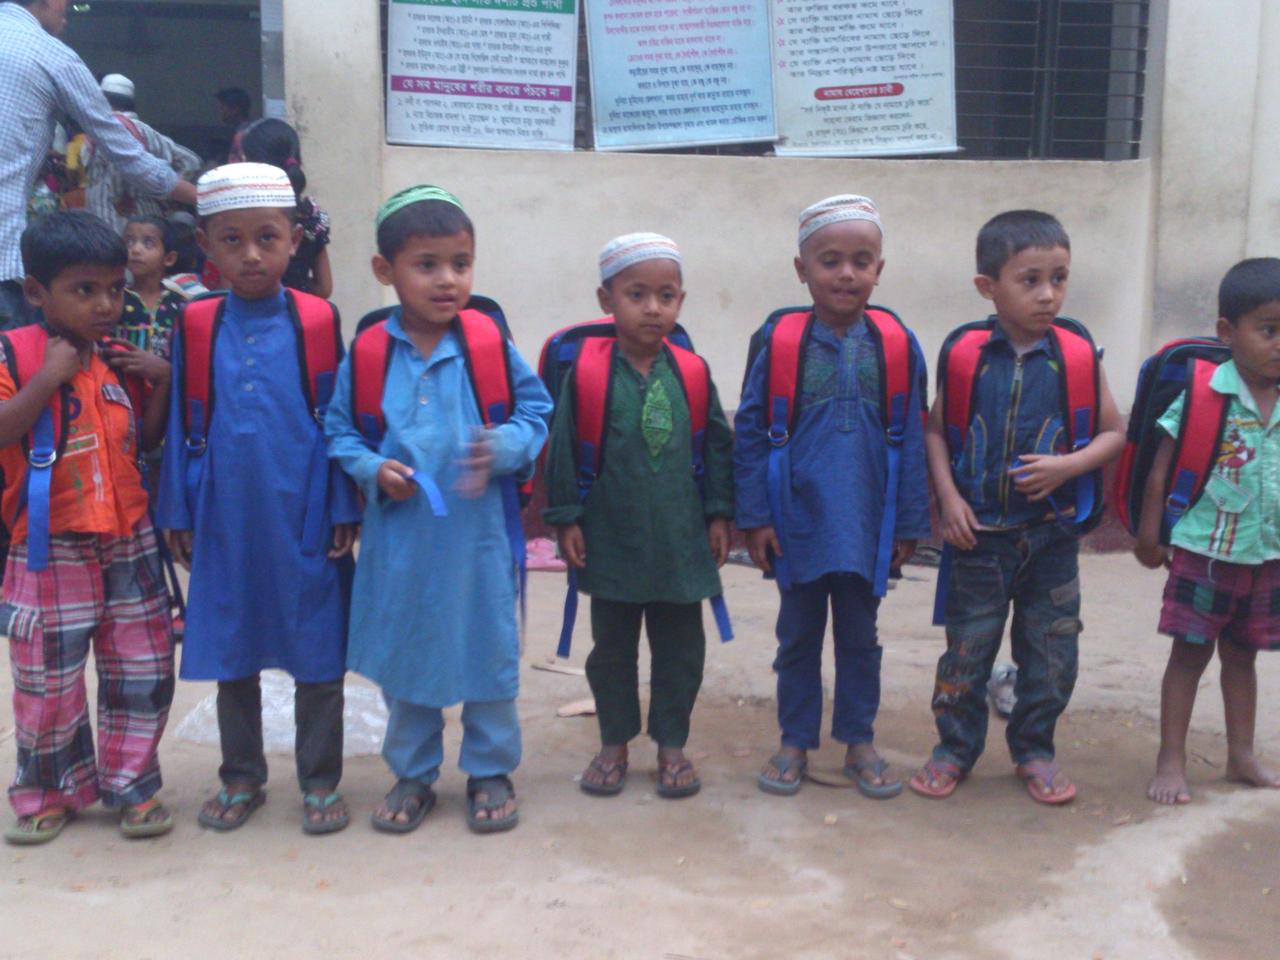 4.2 Bangladesh Kids 1 1280x960 0.4MB.png